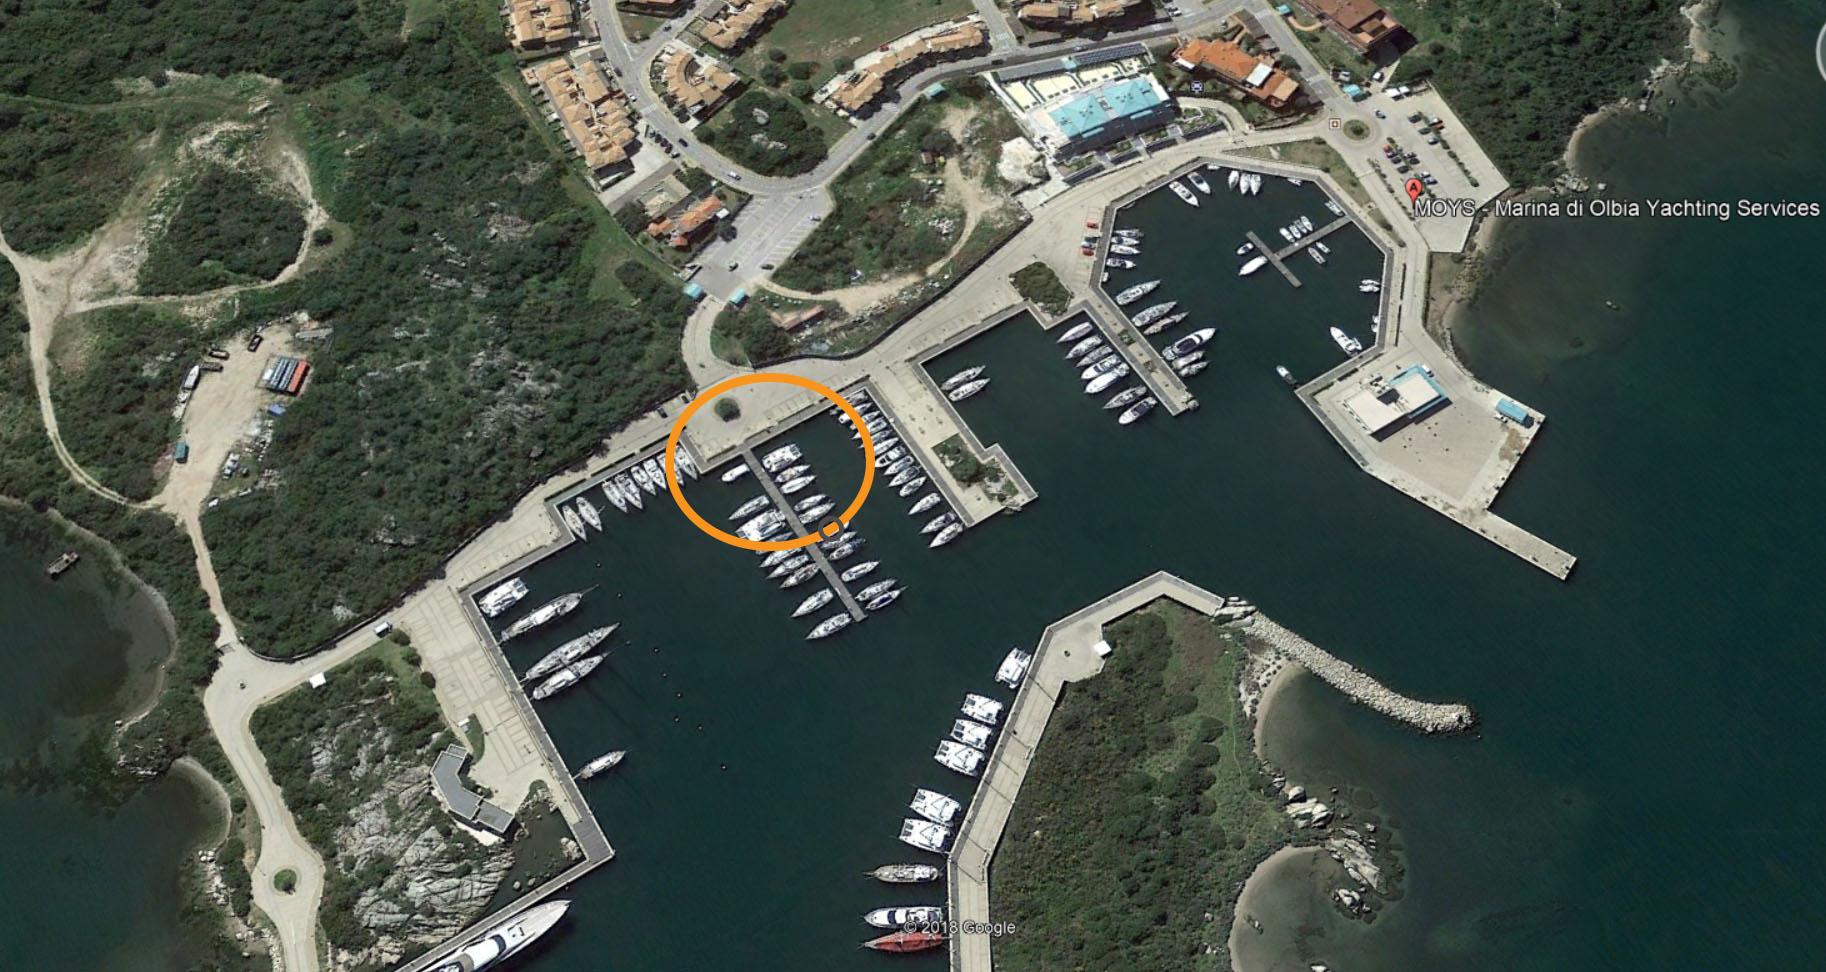 Marina di Olbia (Aladar Sail)